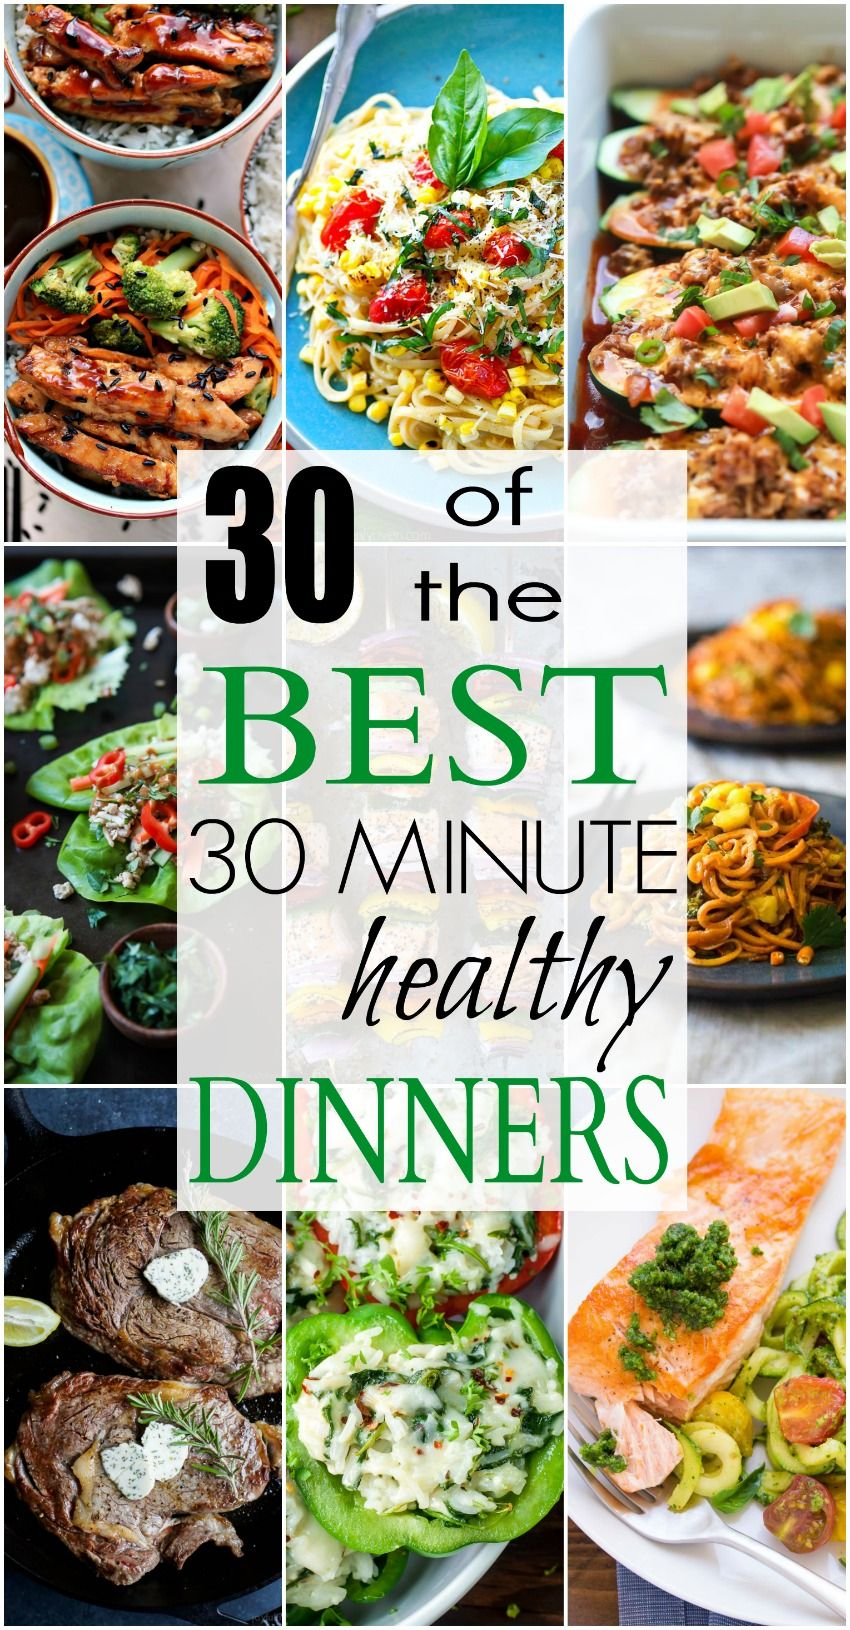 30 Of The Best 30 Minute Healthy Dinners Easy Dinner Ideas Easy Healthy Dinners Healthy Recipes Healthy Dinner